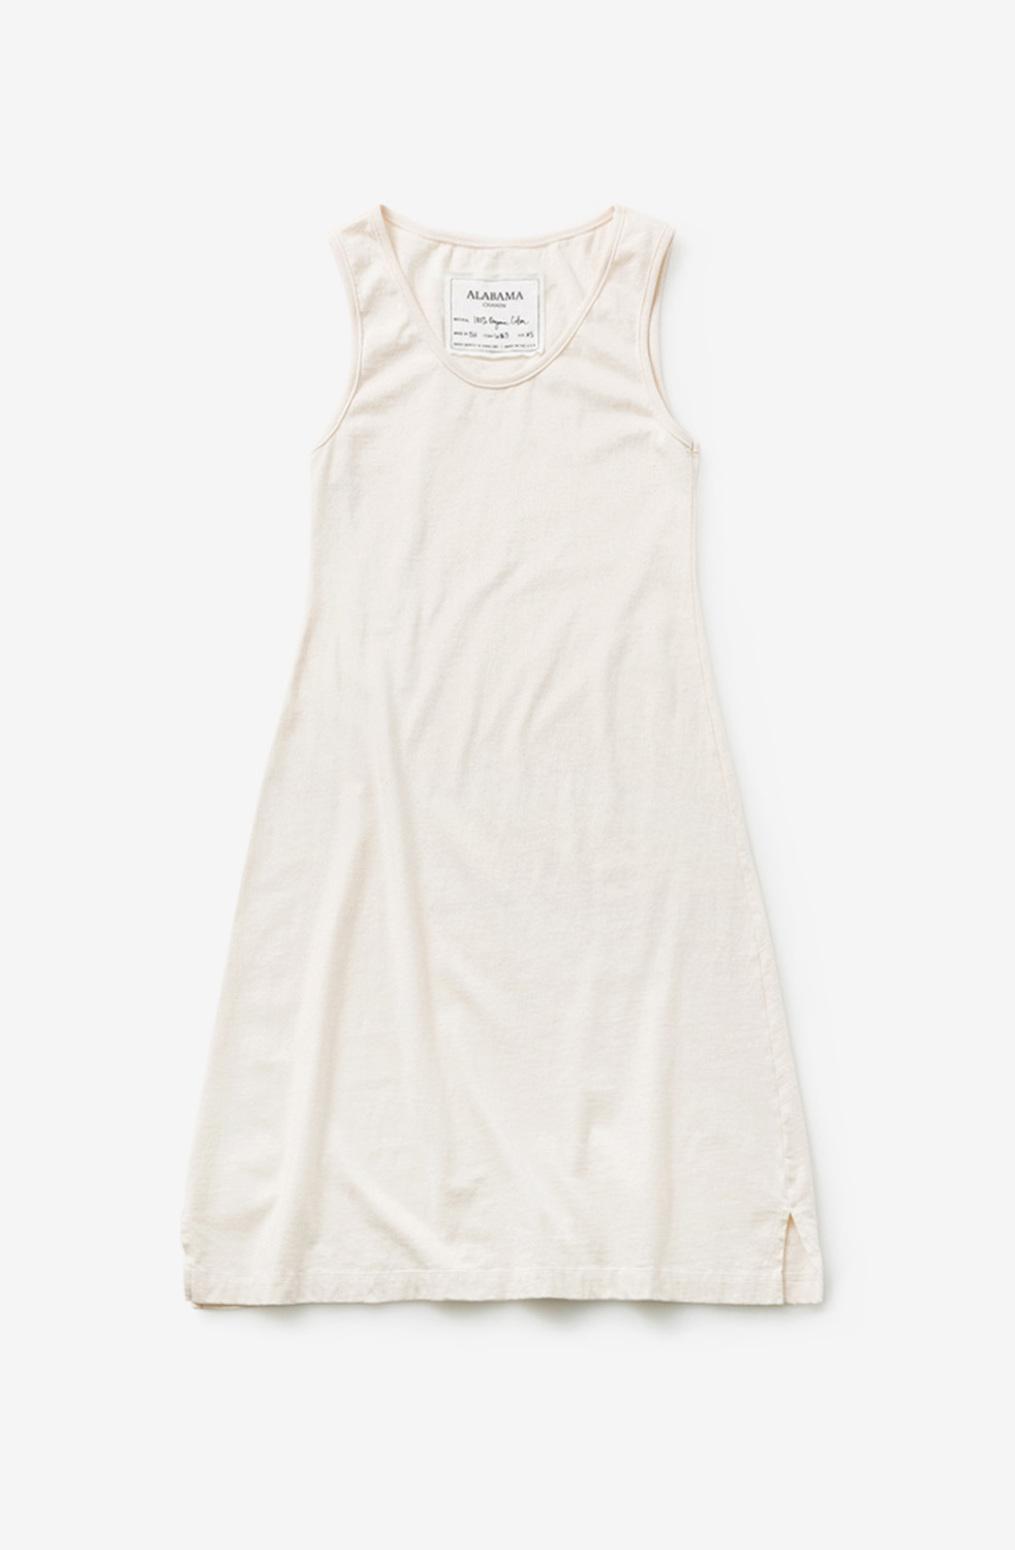 Alabama chanin everyday cotton sleeveless dress 2